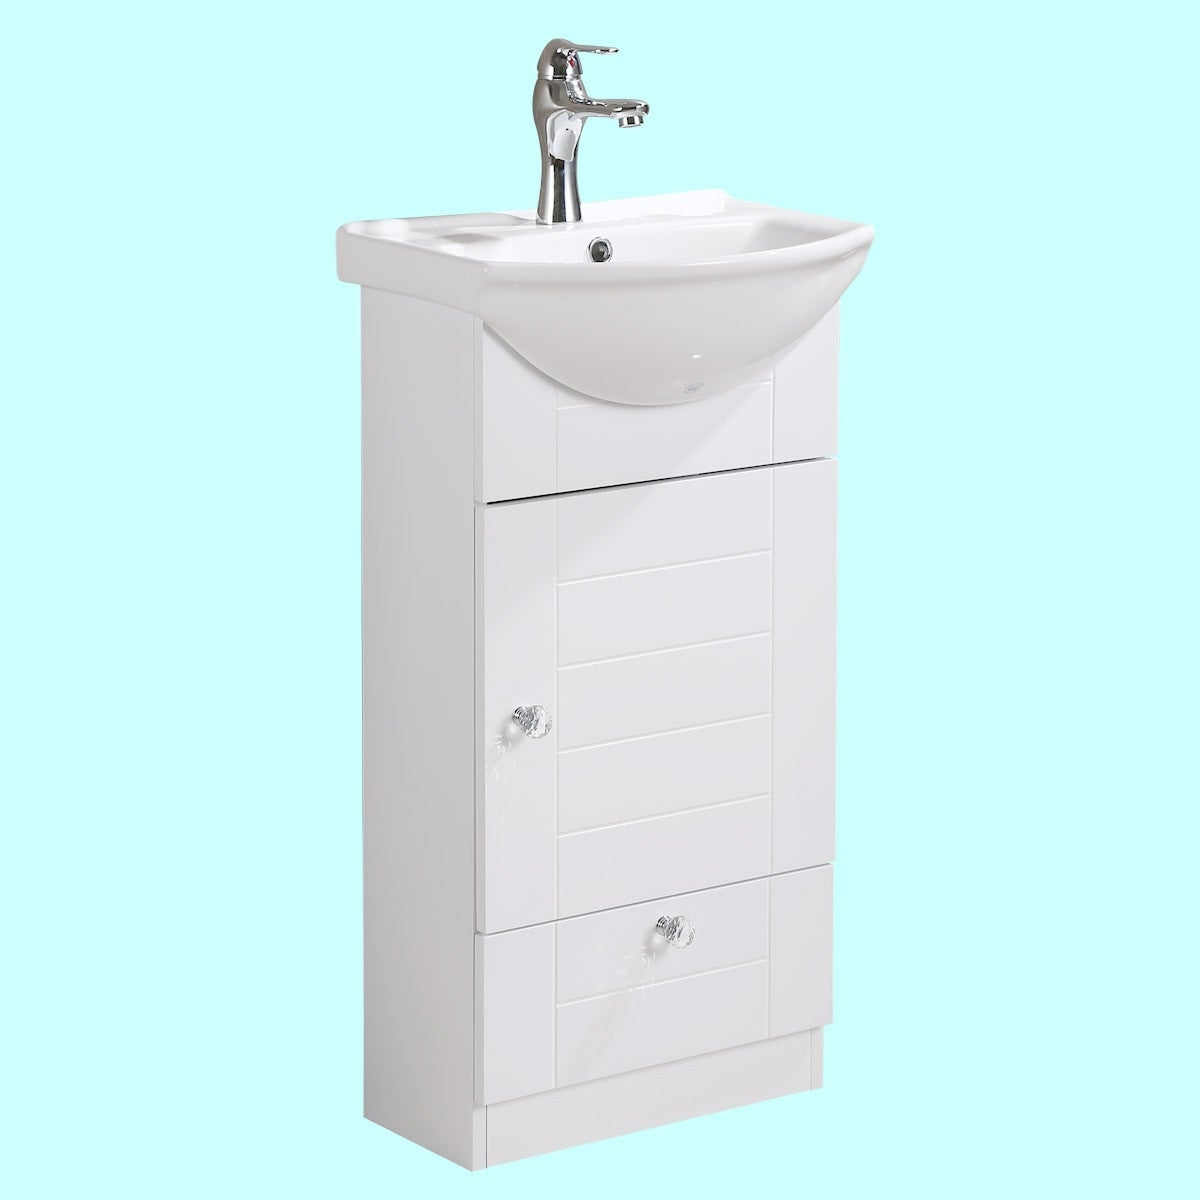 Shop Renovator\'s Supply Vitreous China Small Bathroom Vanity Sink ...